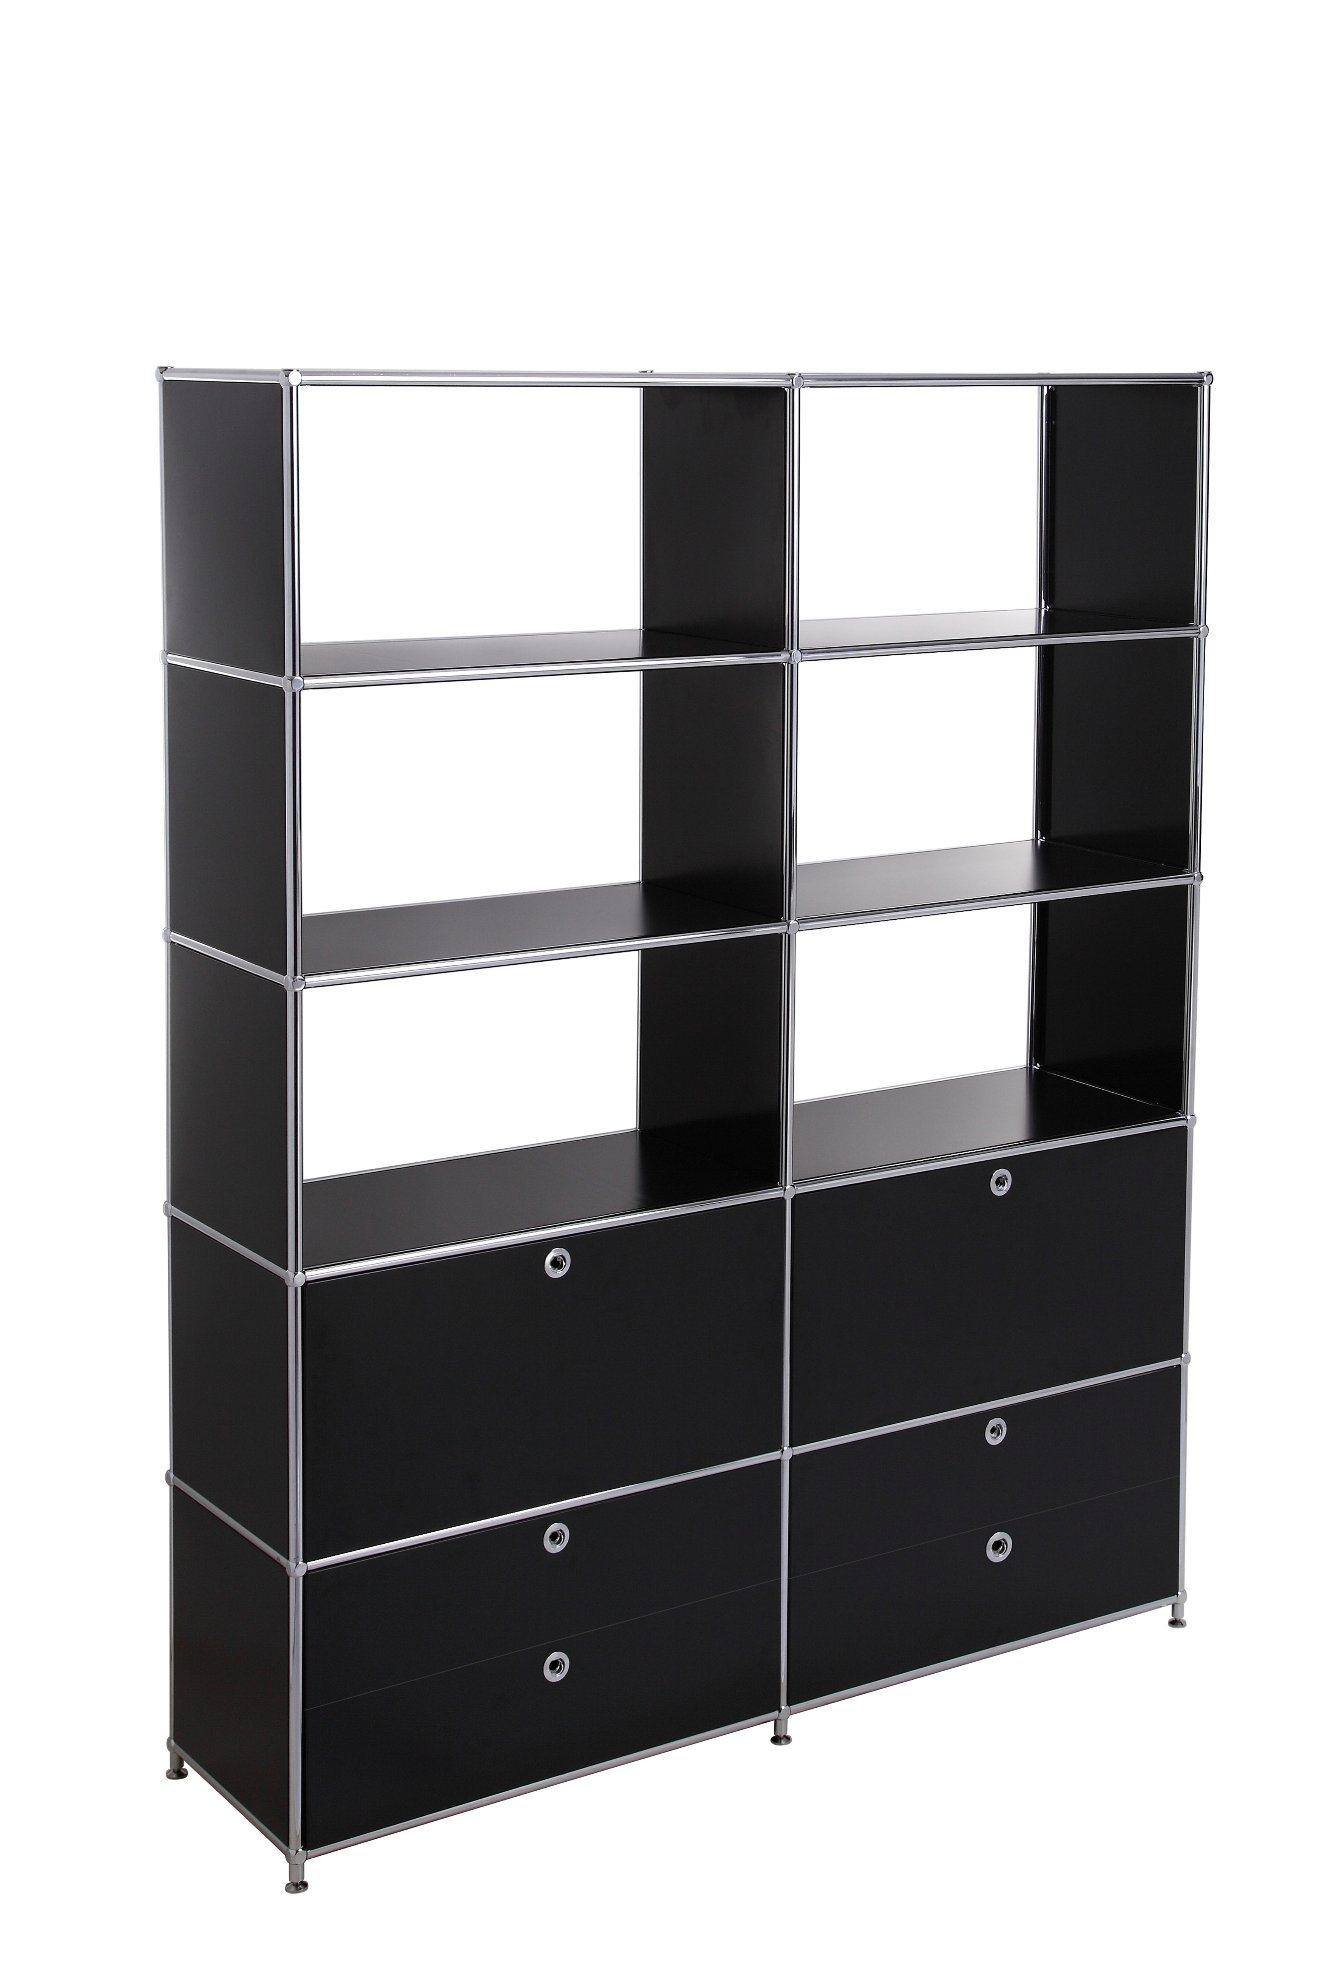 Hot Sale Cheap Office Furniture Vertical Steel File Cabinet